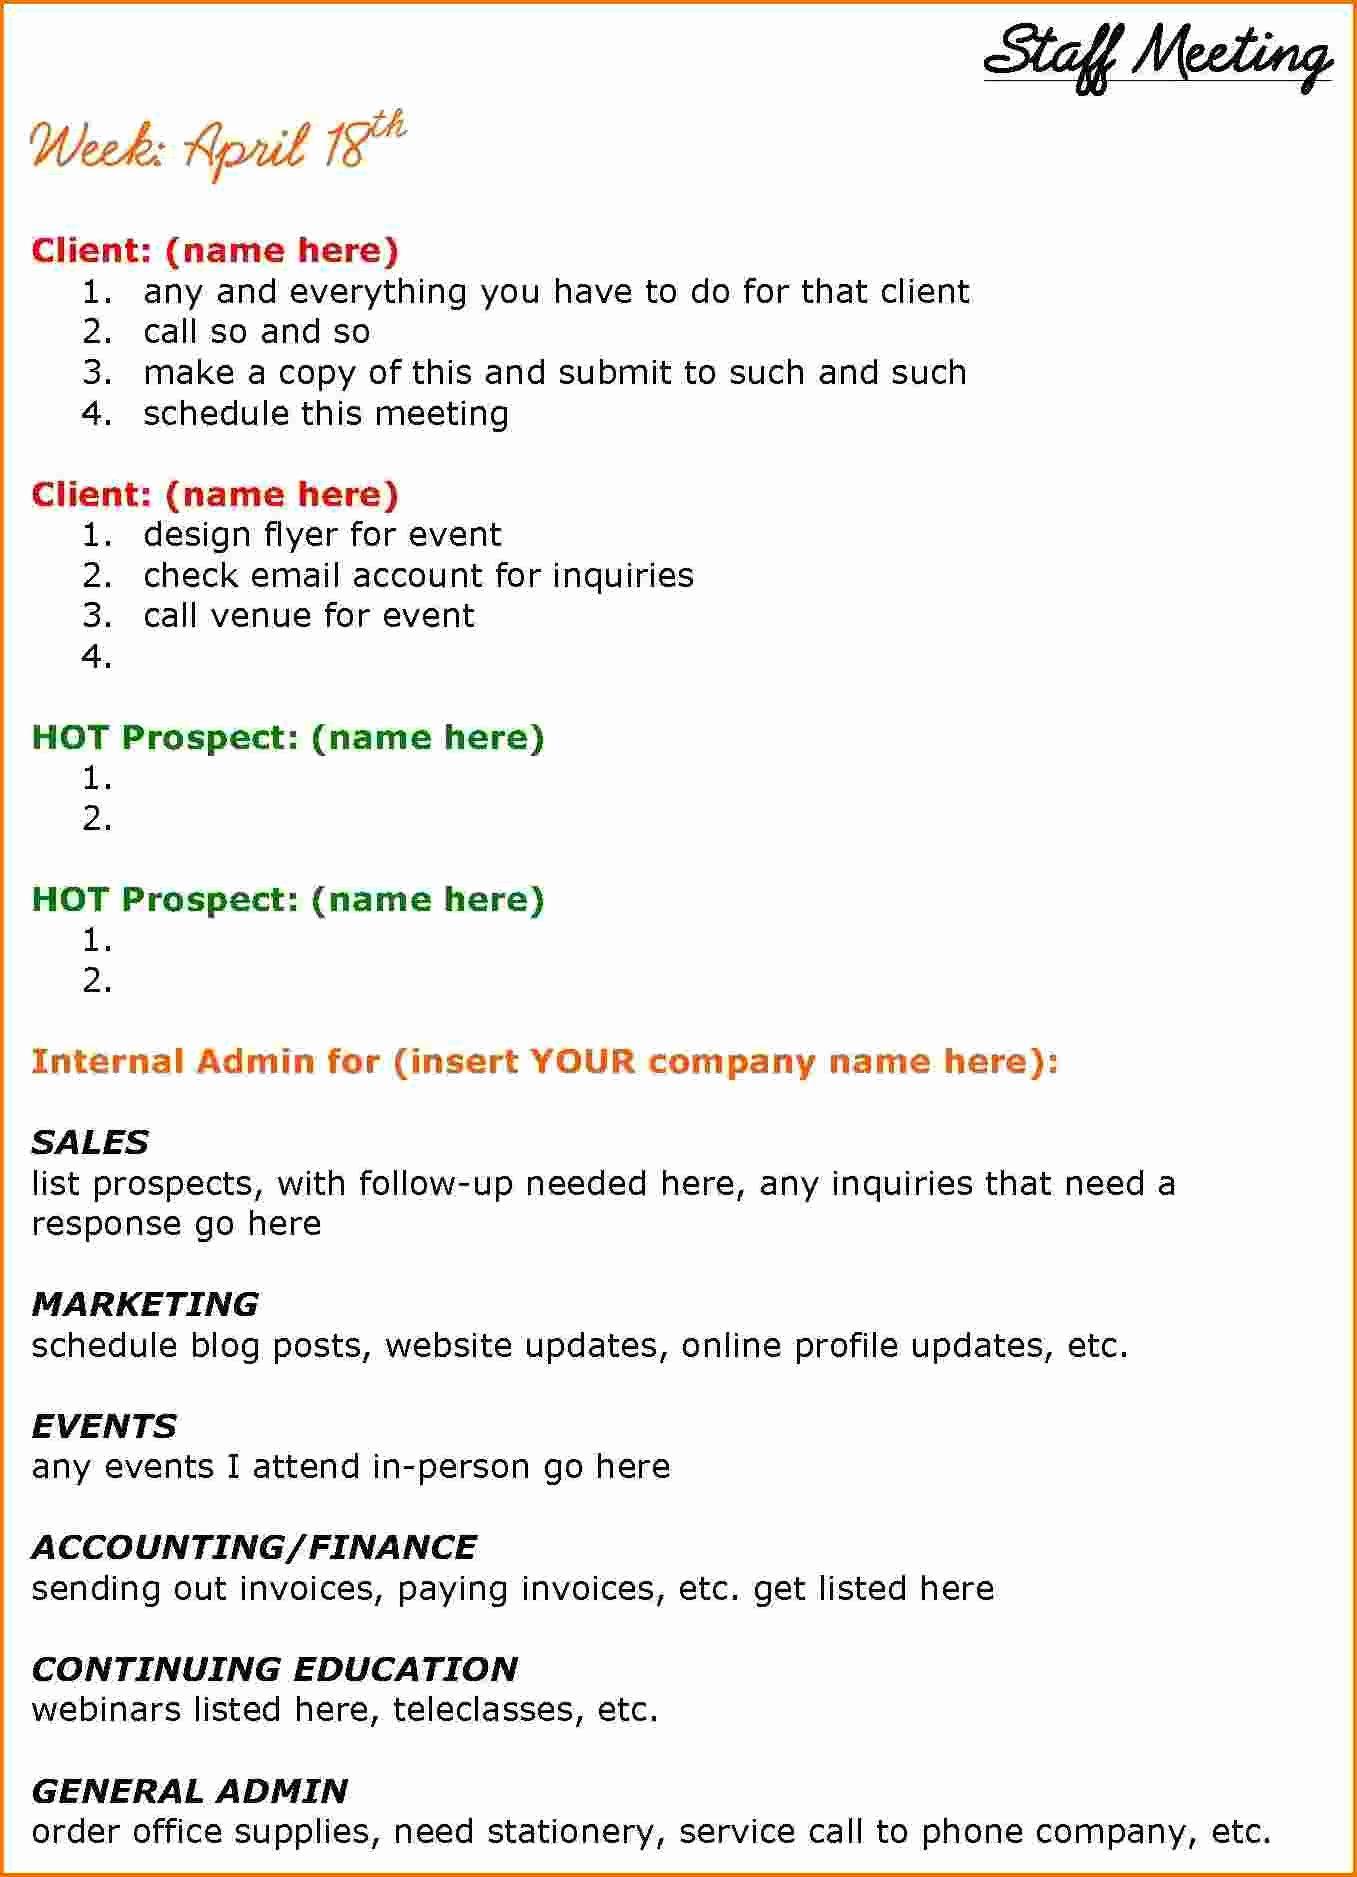 6 Staff Meeting Agenda Template